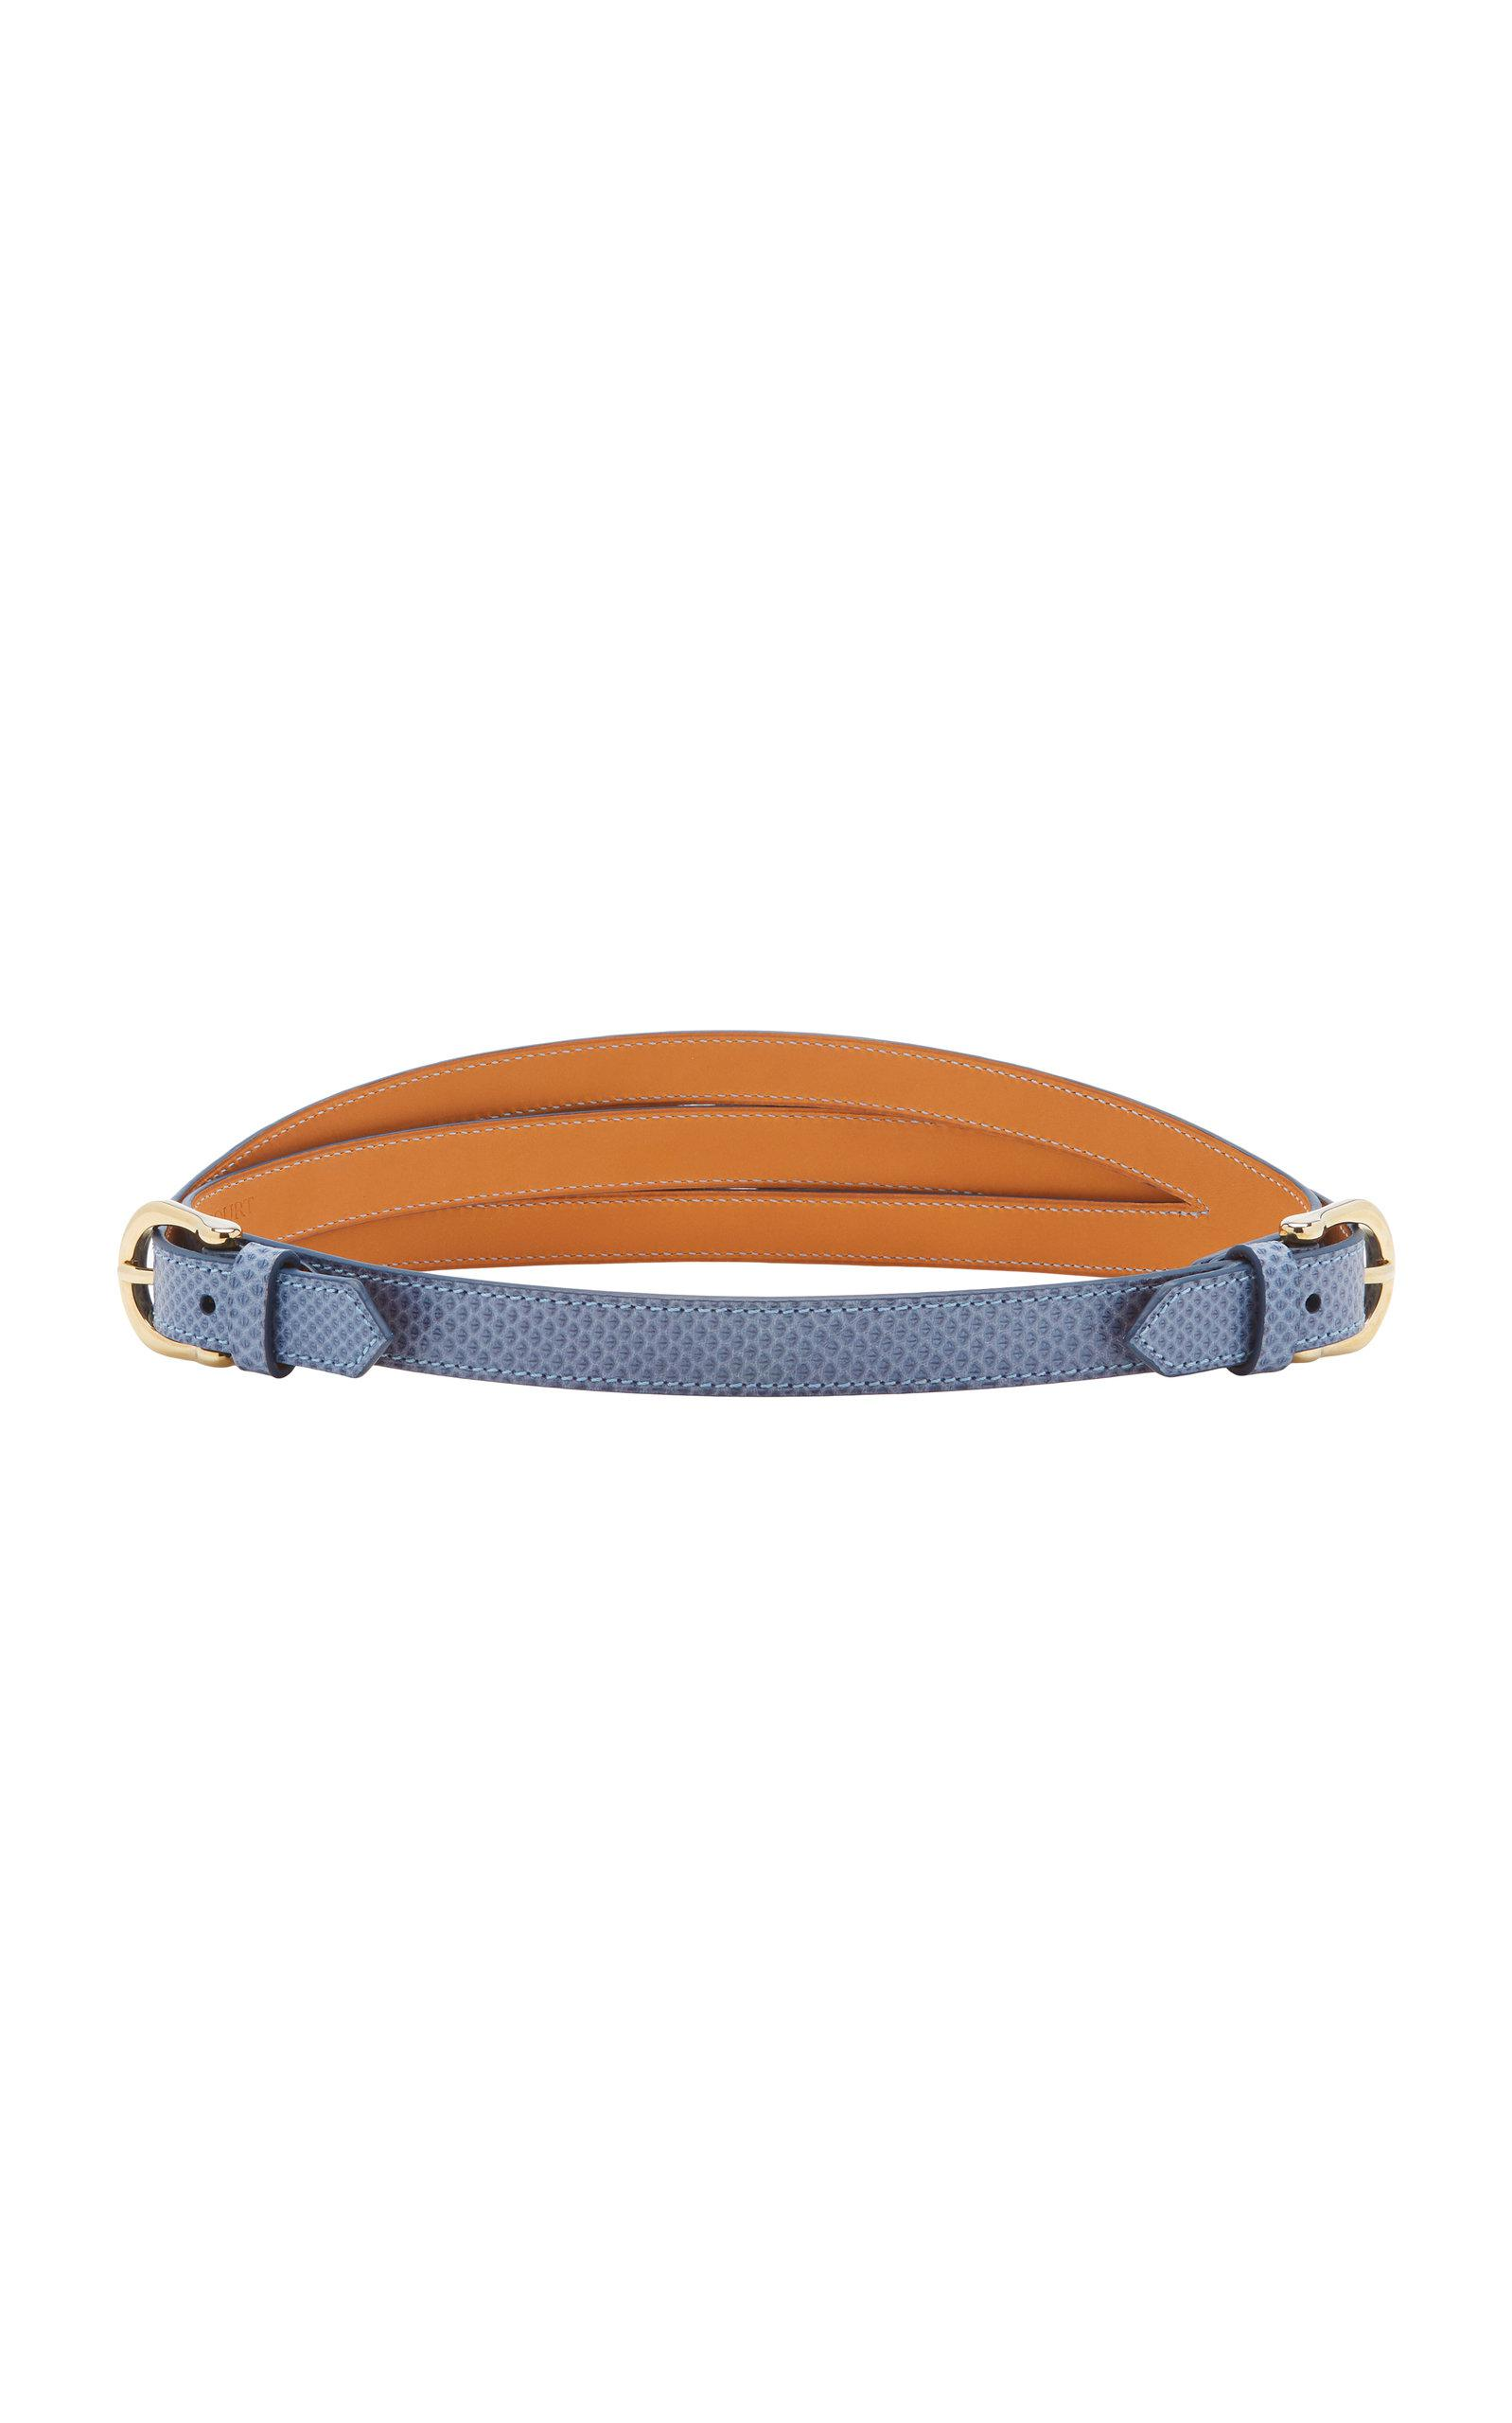 MO exclusive Karung Snake Belt Maison Vaincourt LI830